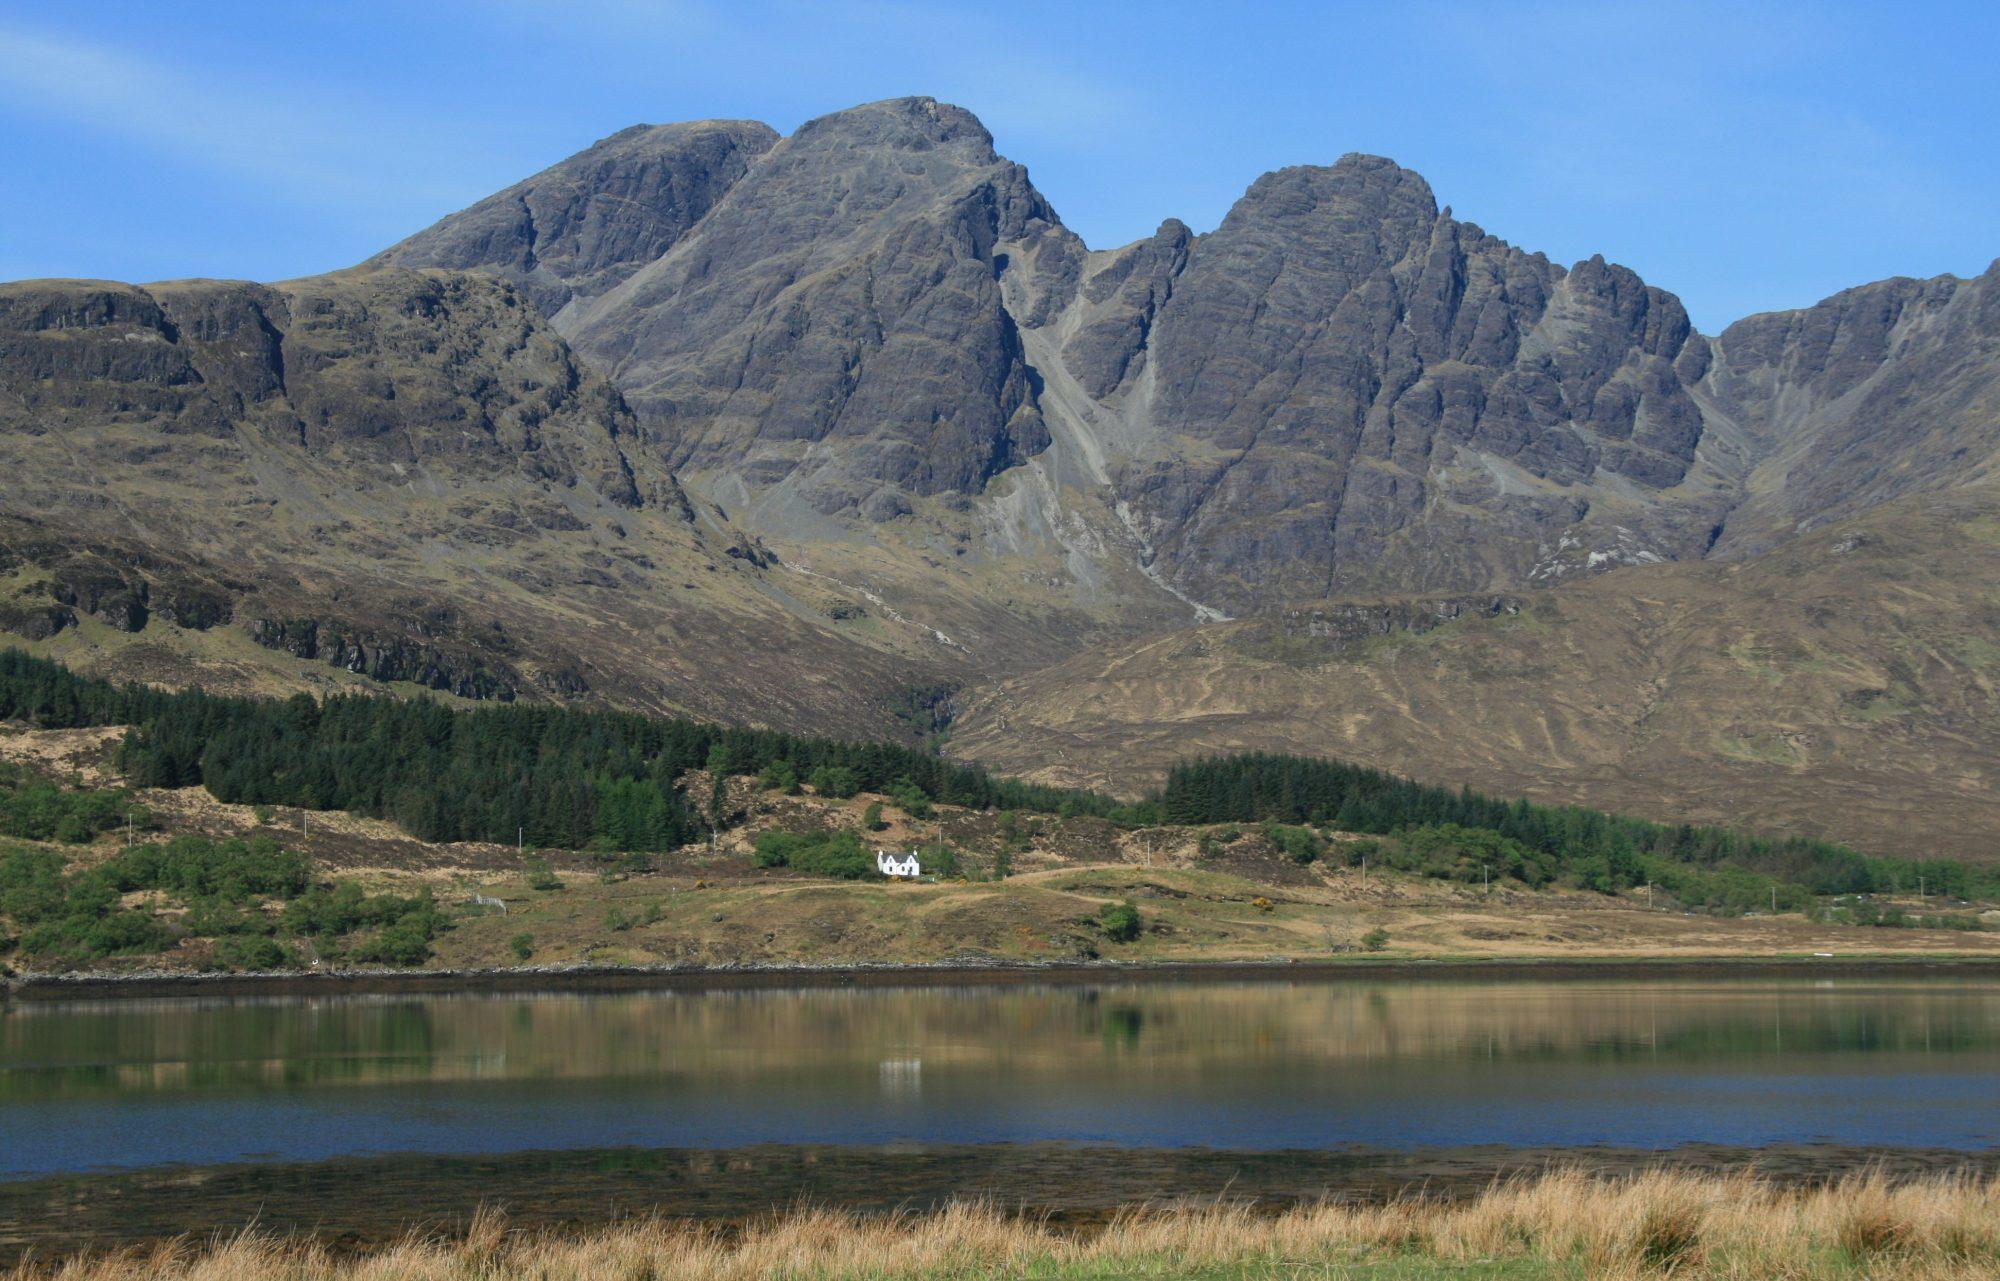 Mountains and a lake - Heart of Scotland Tours